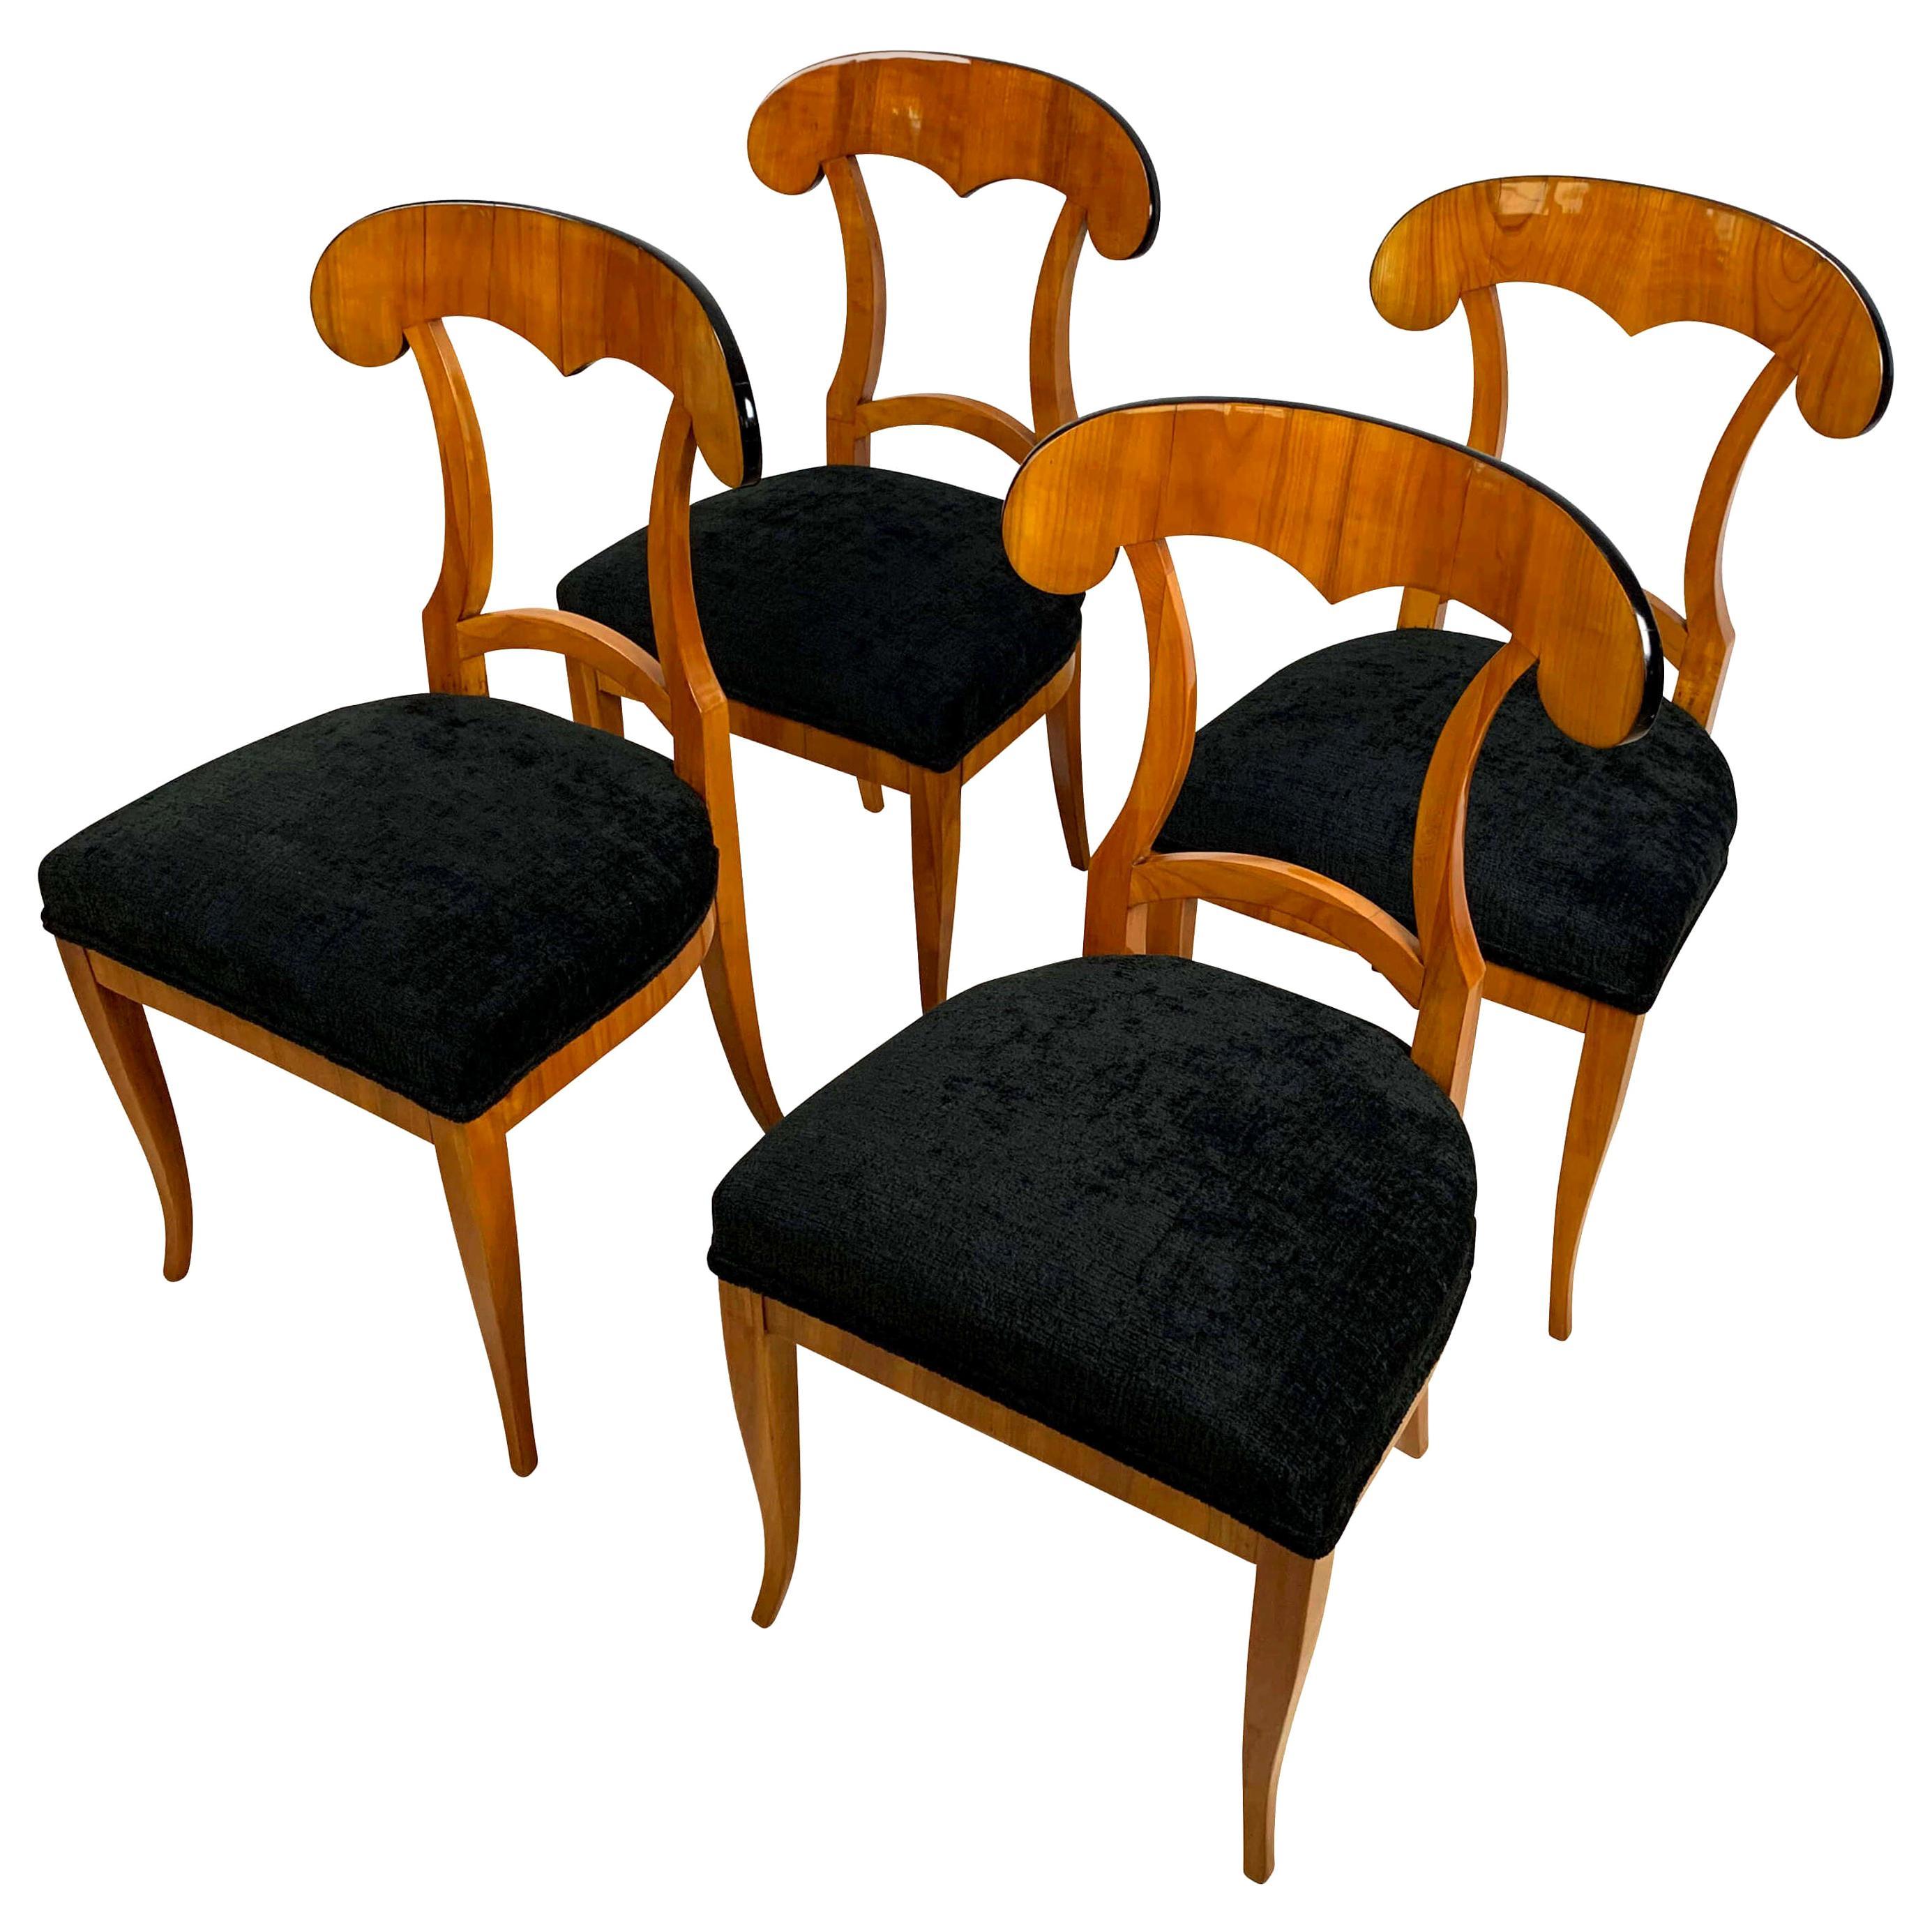 Set of Four Biedermeier Shovel Chairs, Cherry Veneer, South Germany, circa 1820